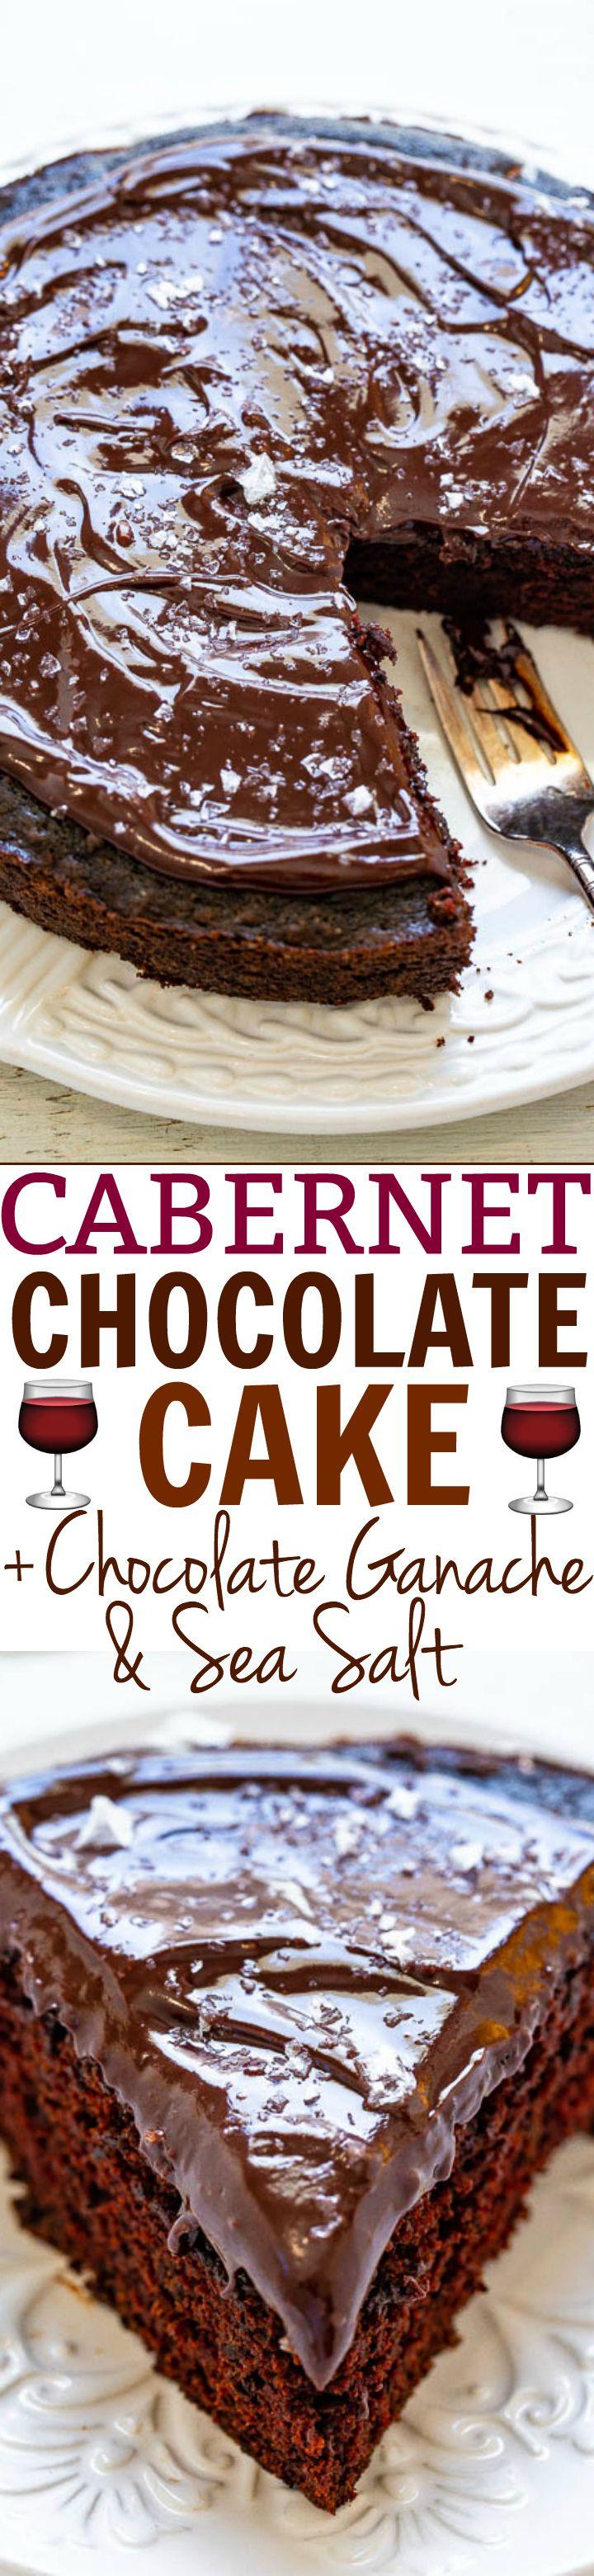 966 best Boozy Desserts images on Pinterest